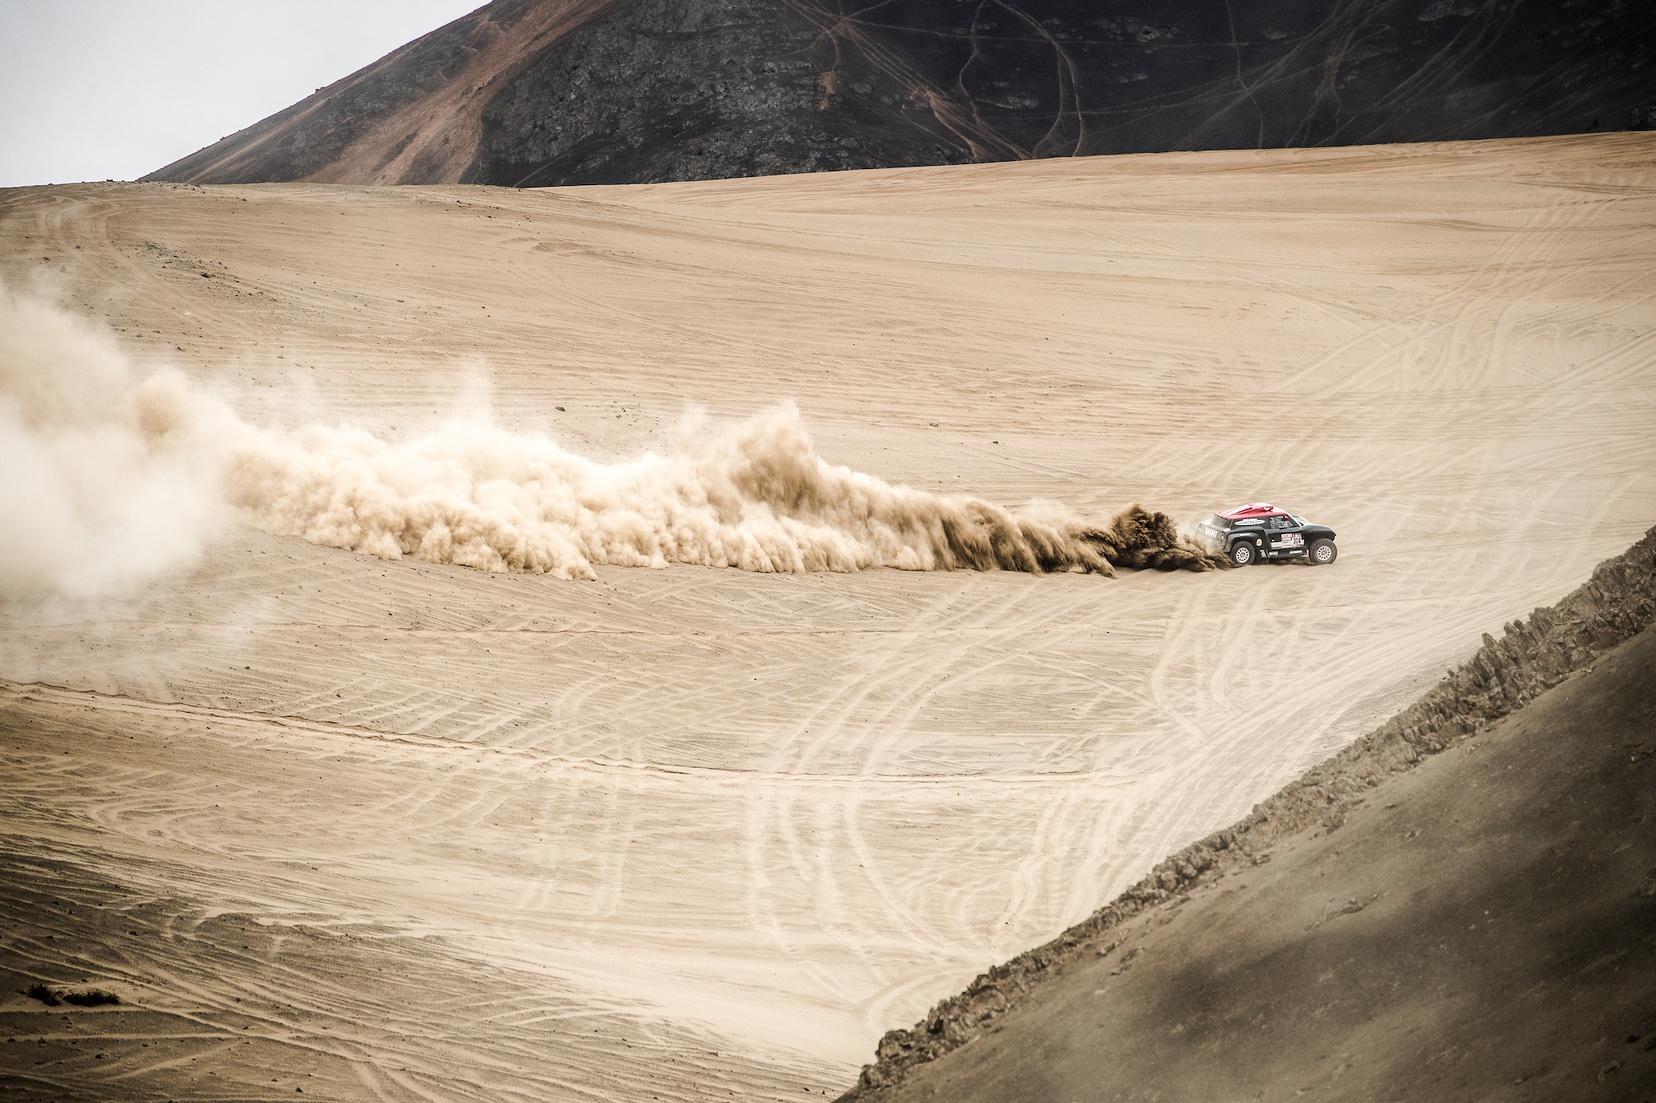 X-raid MINI JCW Team - 2019 Dakar Rally